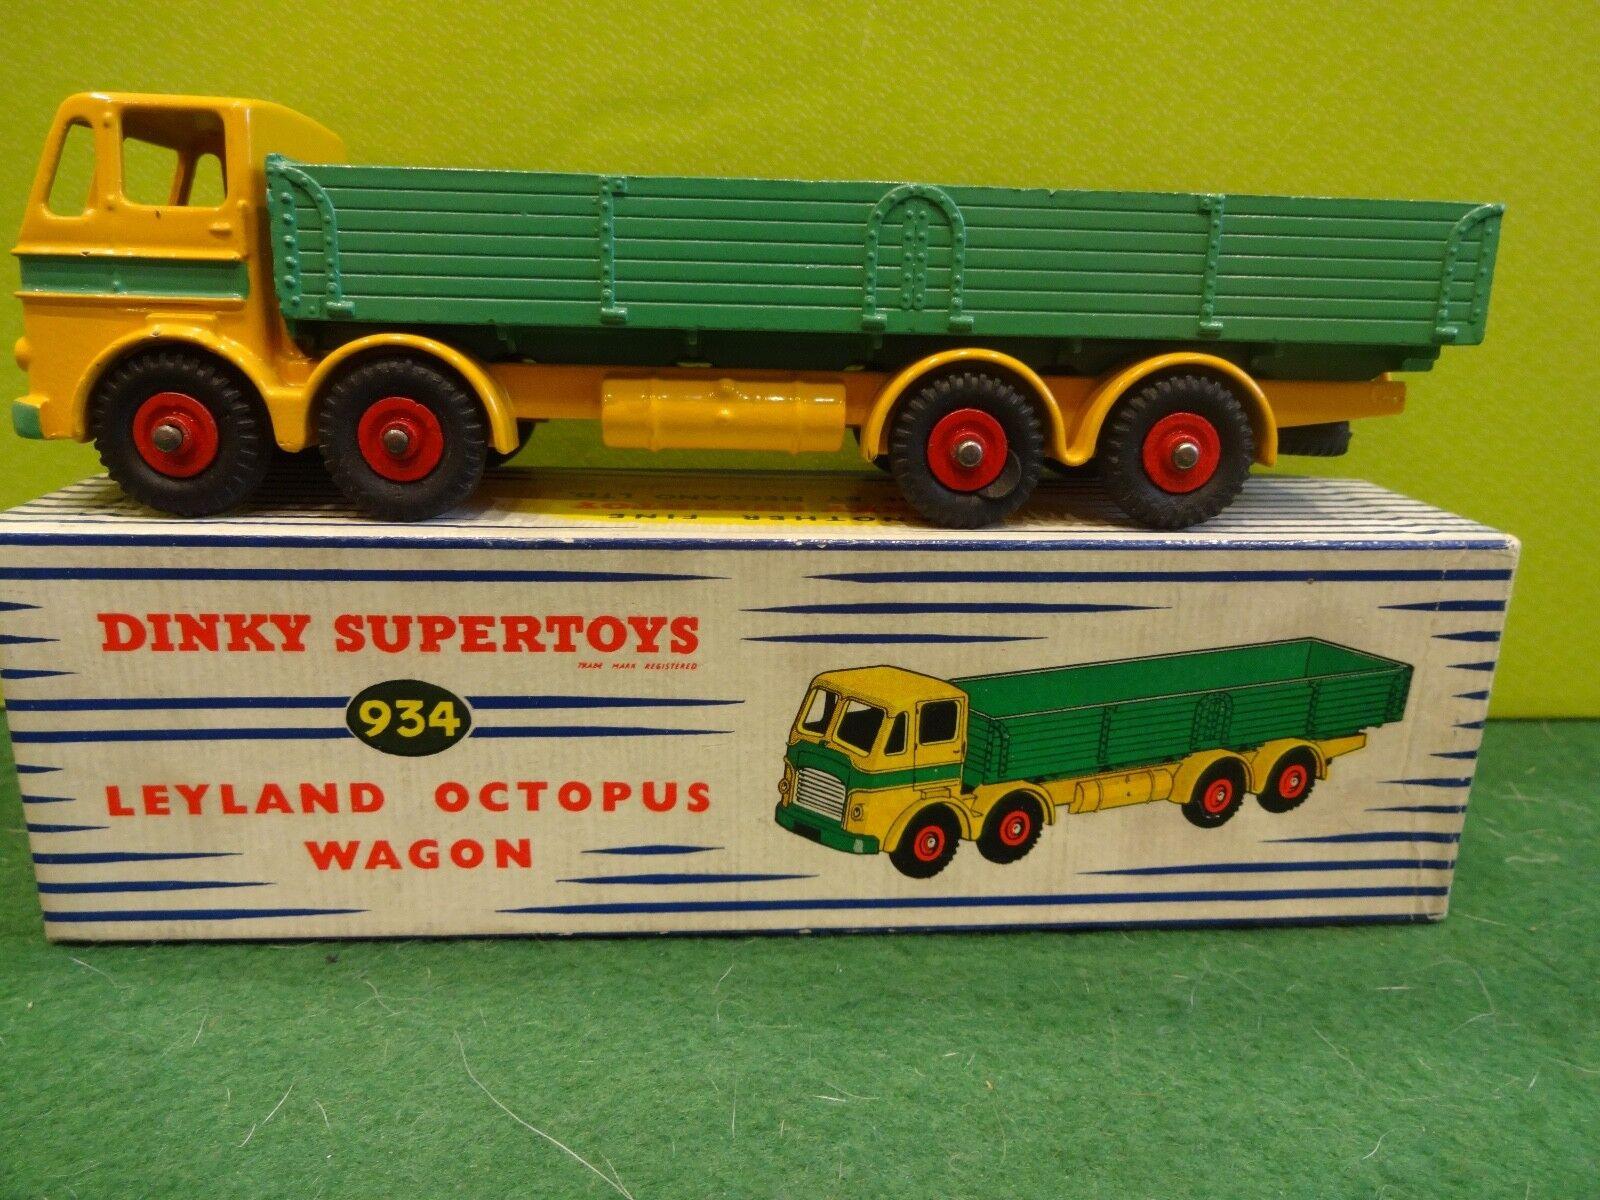 DINKY SUPERTOYS LEYLAND OCTOPUS WAGON 934